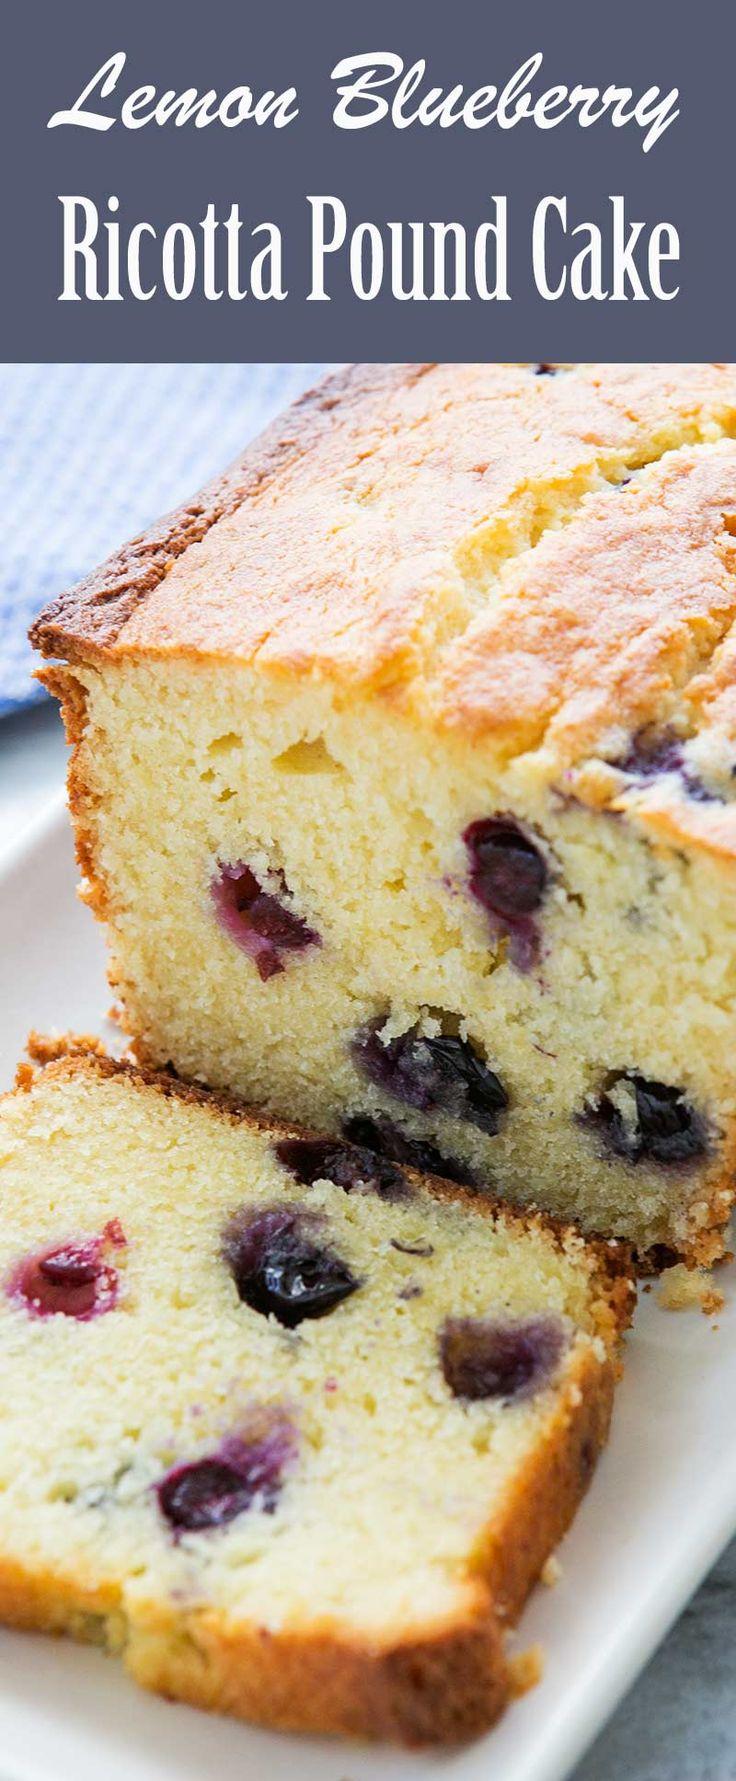 Lemon Blueberry Ricotta Pound Cake ~ Delicious fine crumb pound cake with butter, eggs, ricotta cheese, sugar, flour, lemon zest, and blueberries. ~ SimplyRecipes.com